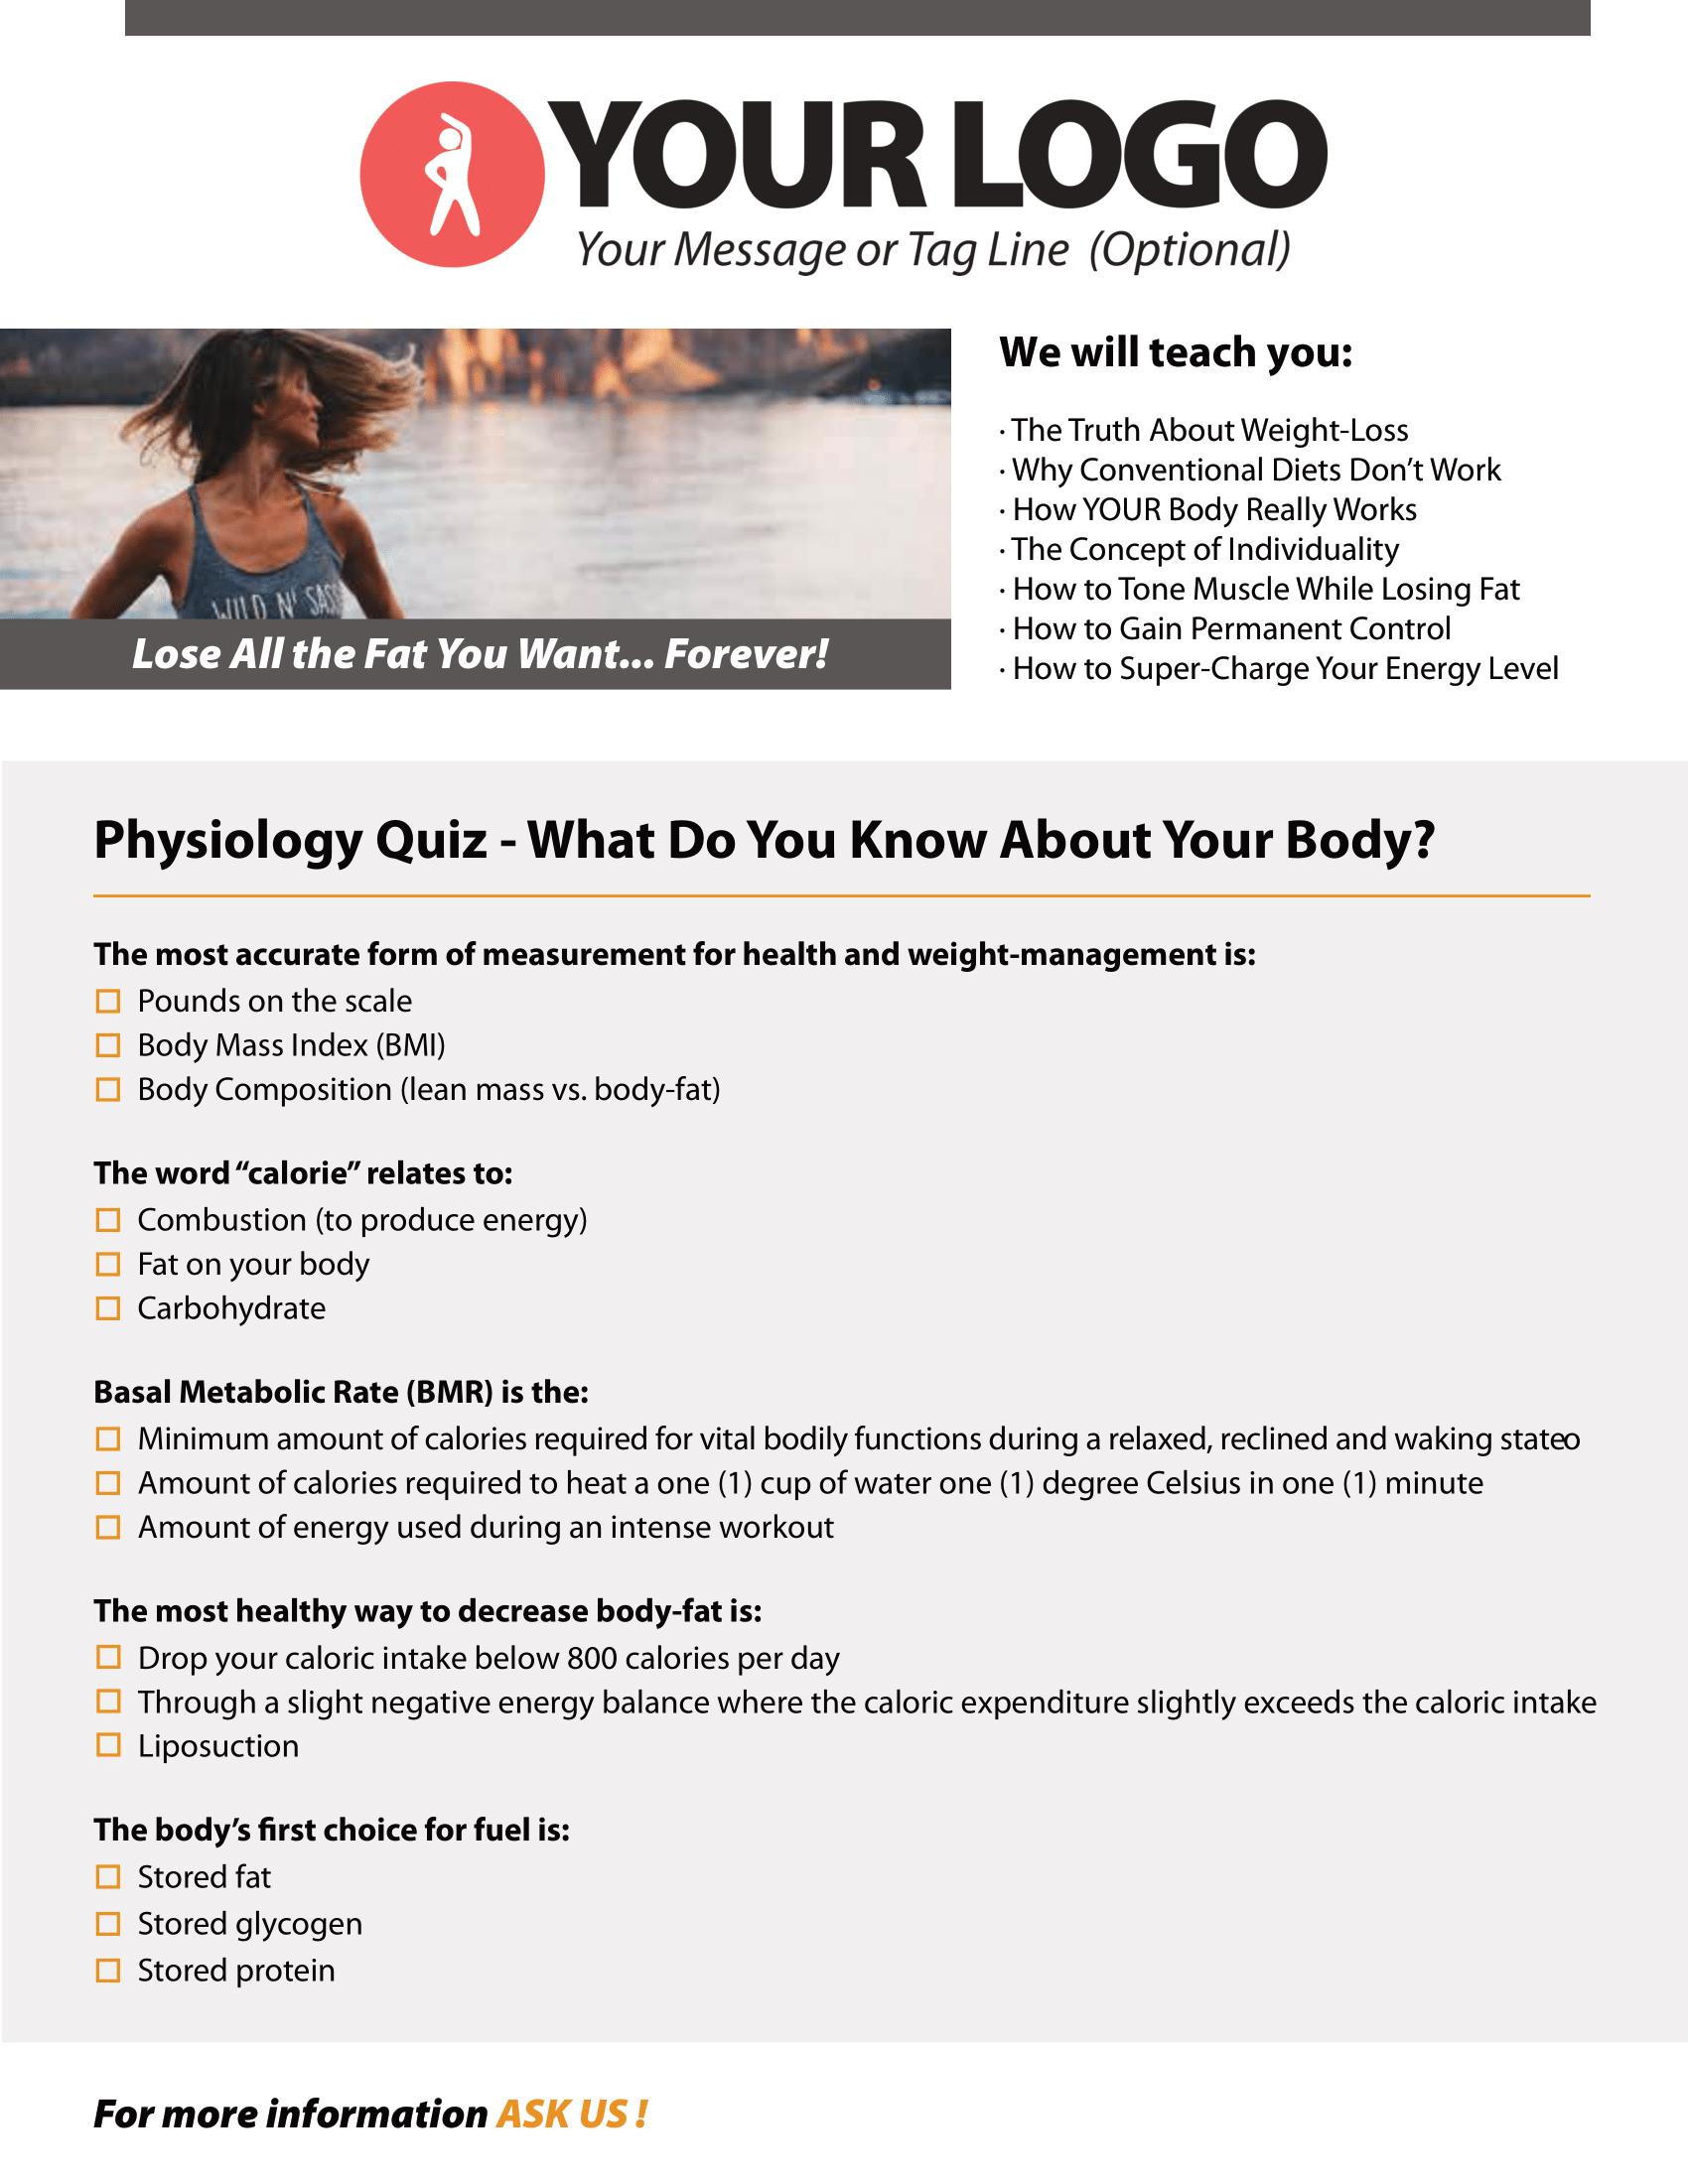 YOUR_LOGO_Quiz01_WE-1